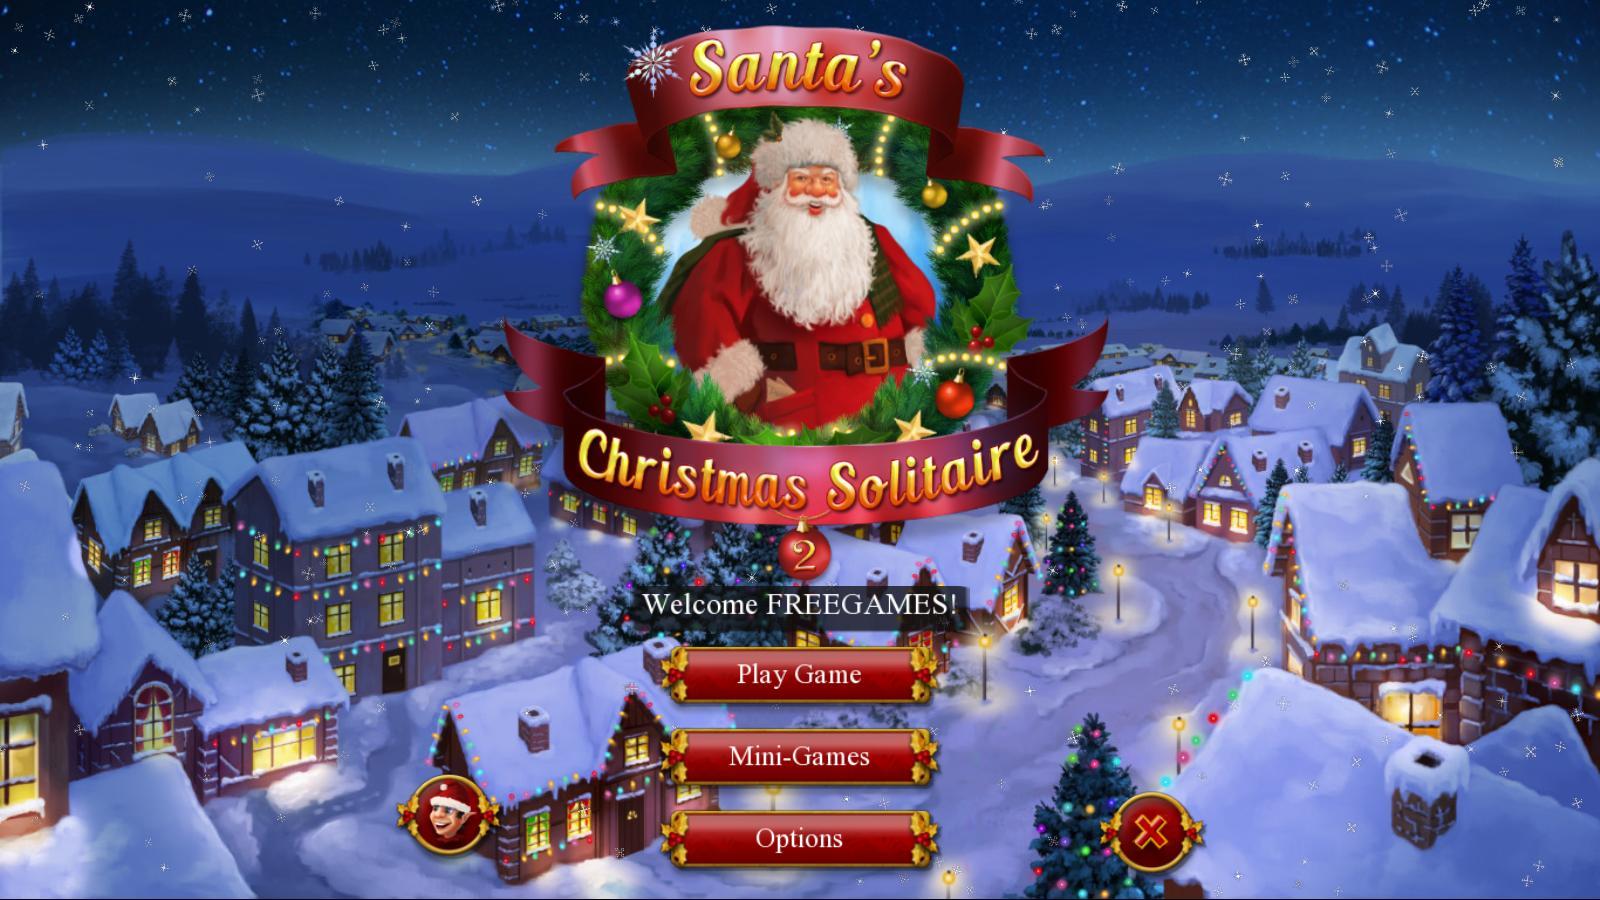 Рождественский пасьянс Санты 2 | Santa's Christmas Solitaire 2 (En)